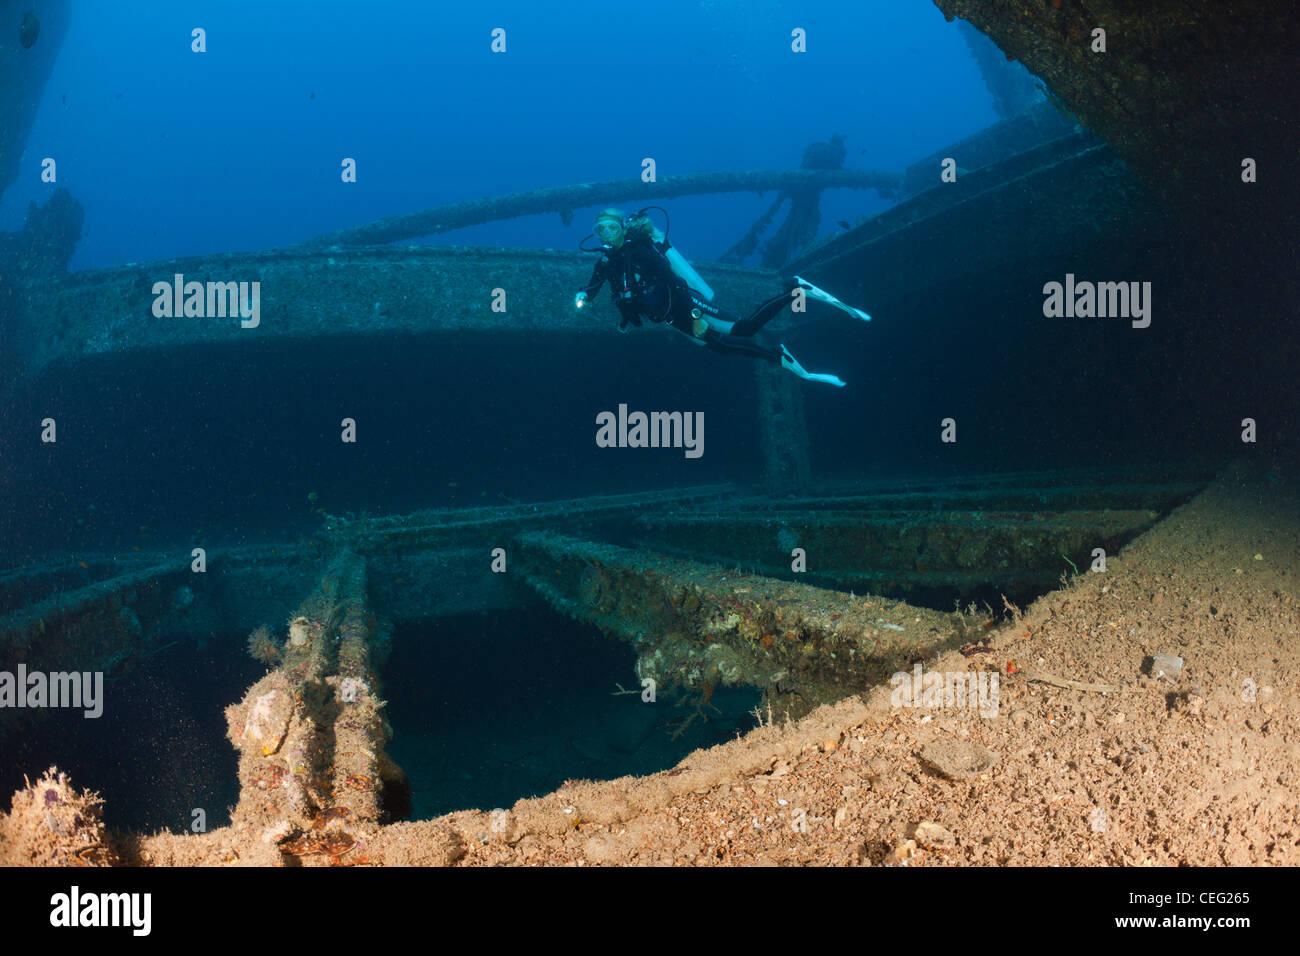 Scuba Diver over Cargo Space of Maldive Victory Wreck, North Male Atoll, Indian Ocean, Maldives - Stock Image